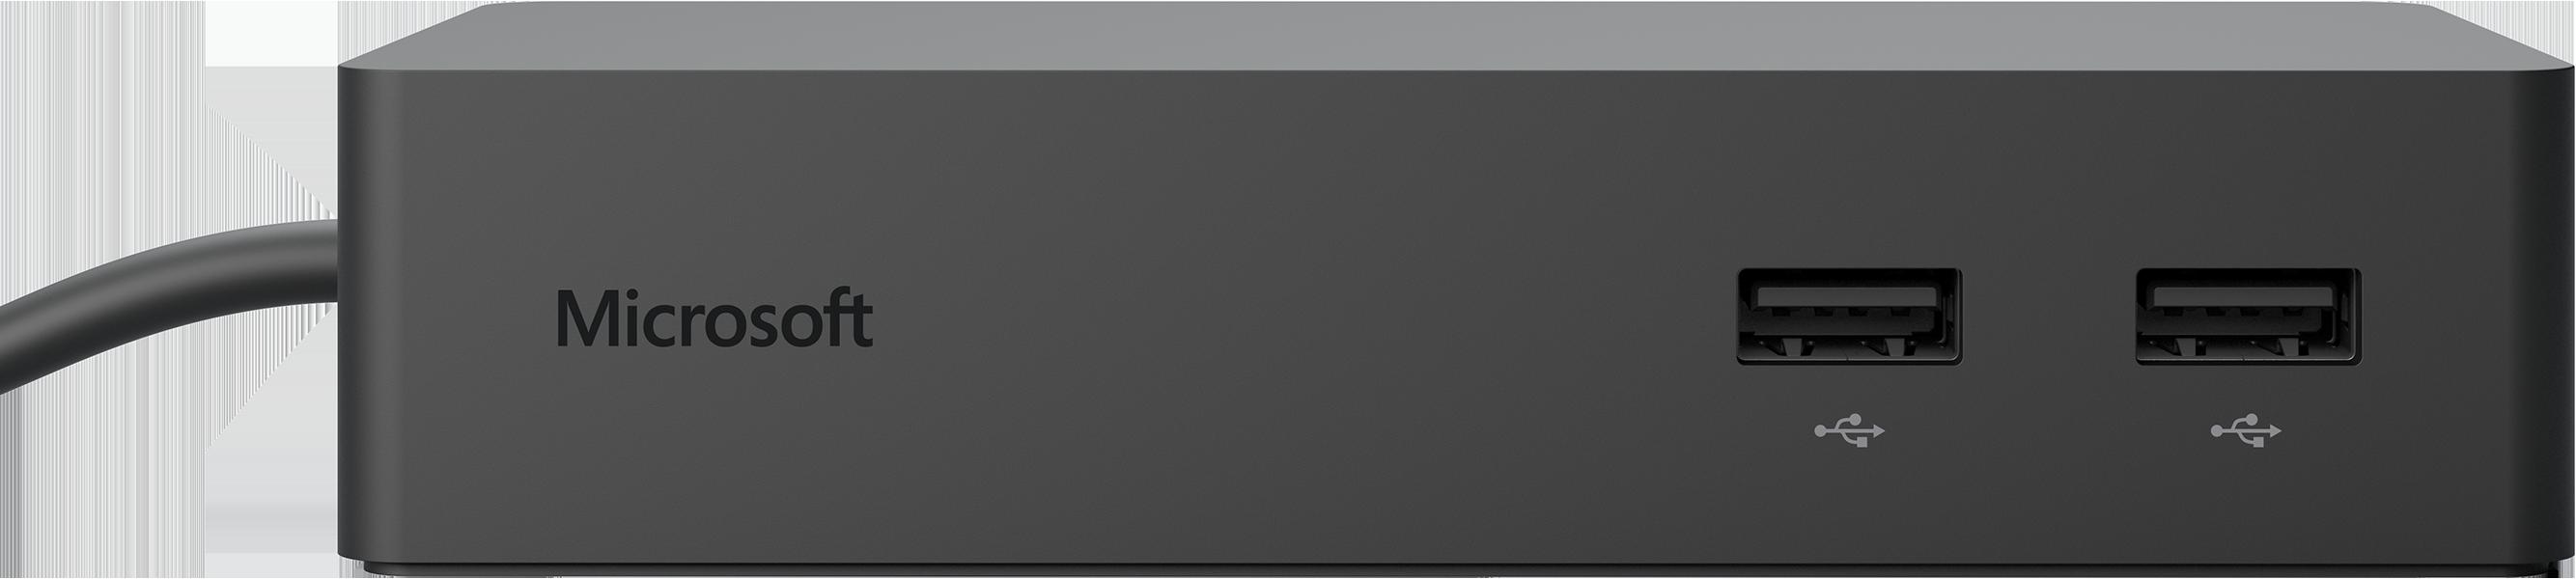 Microsoft Docking Station Audio Device Treiber Windows 7